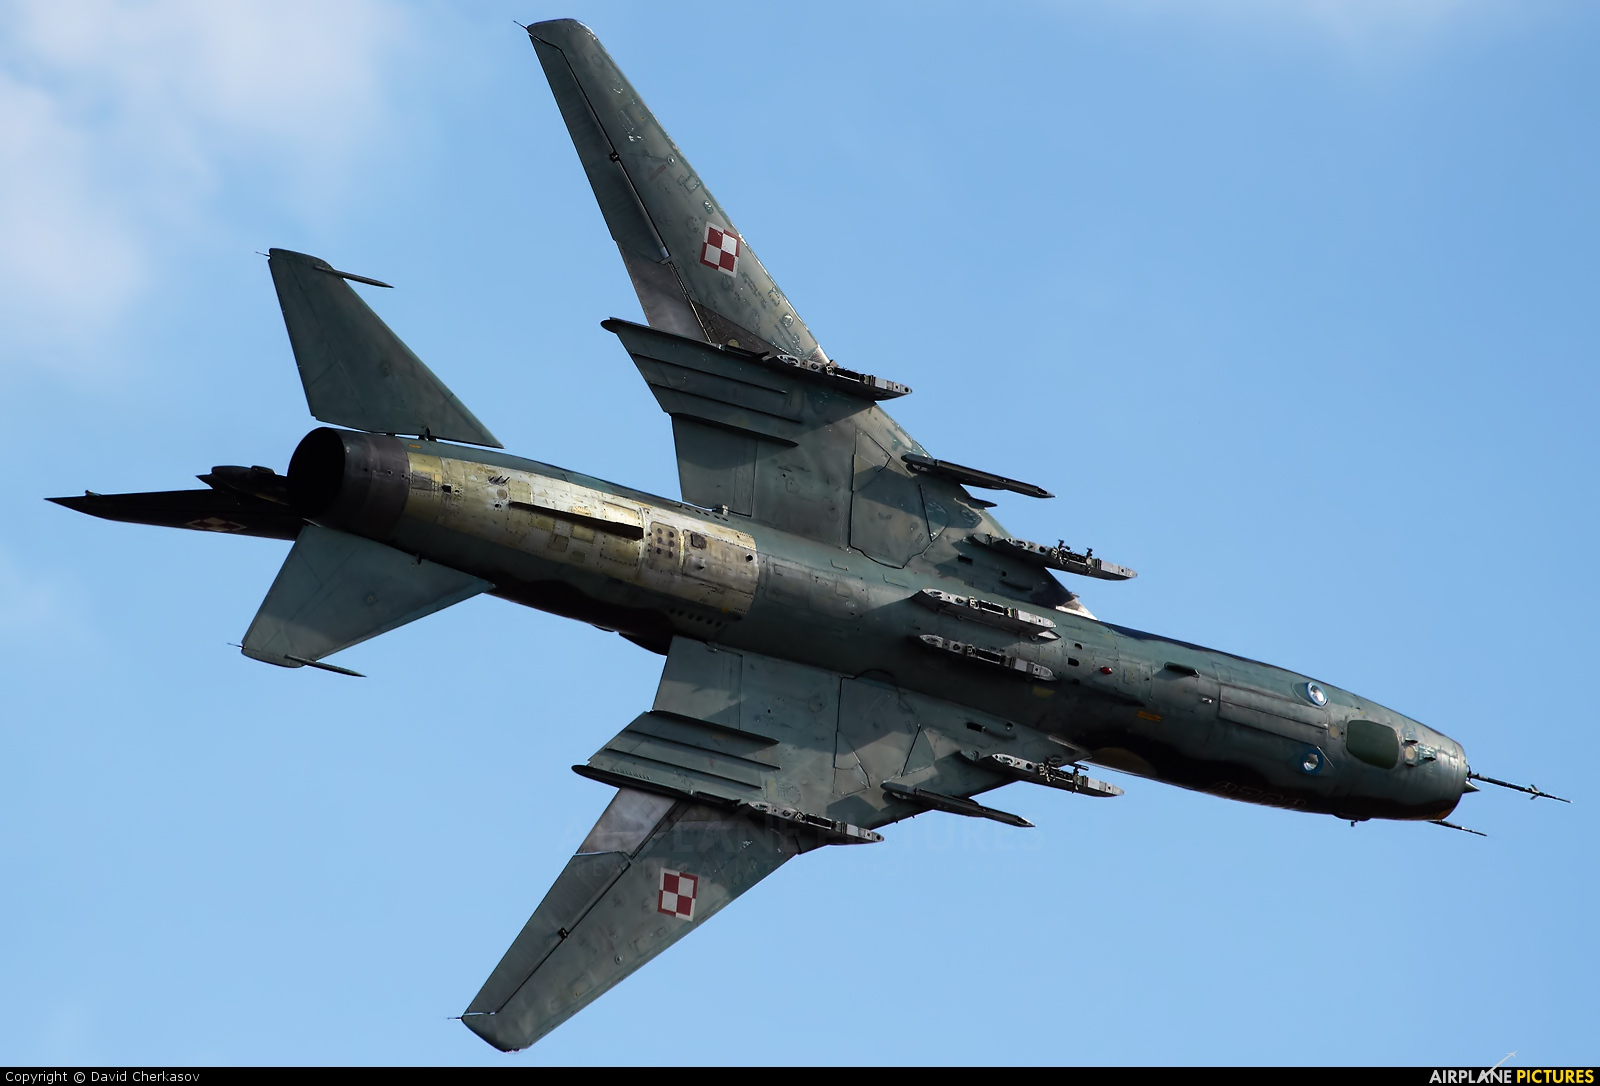 Poland - Air Force 8308 aircraft at Radom - Sadków